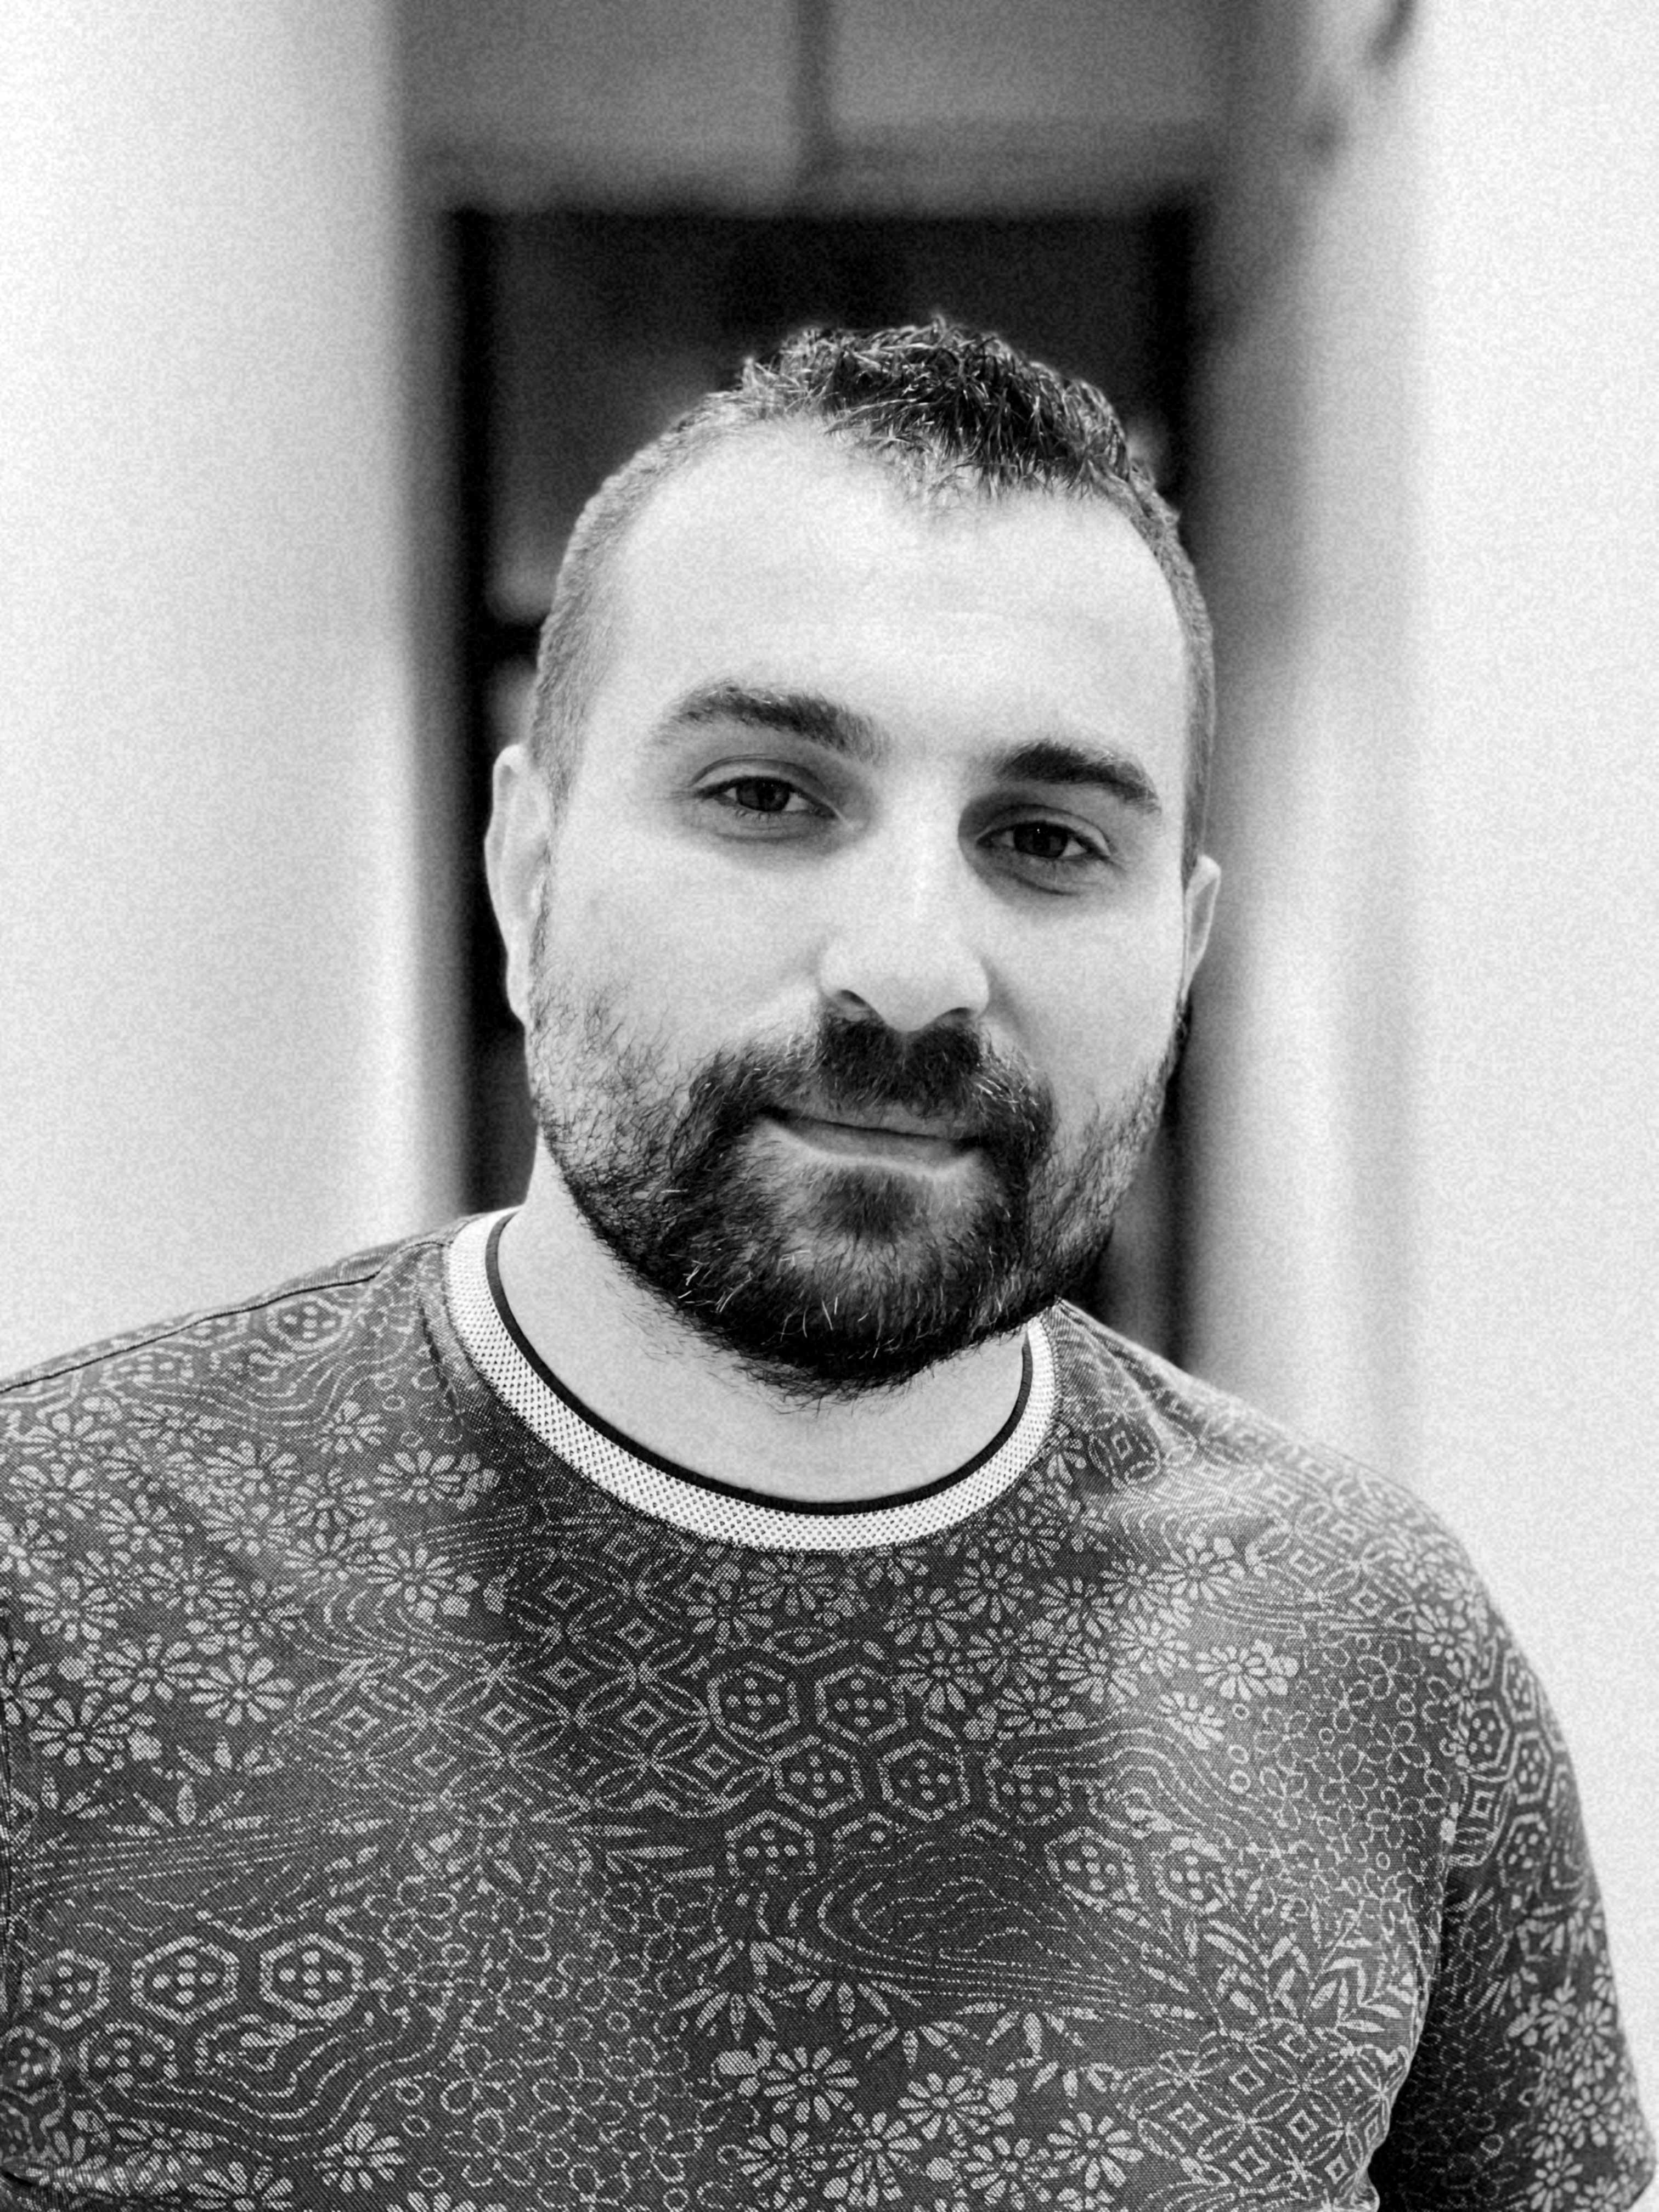 Picture of Stanimir Simeonov, CTO of Skillwork